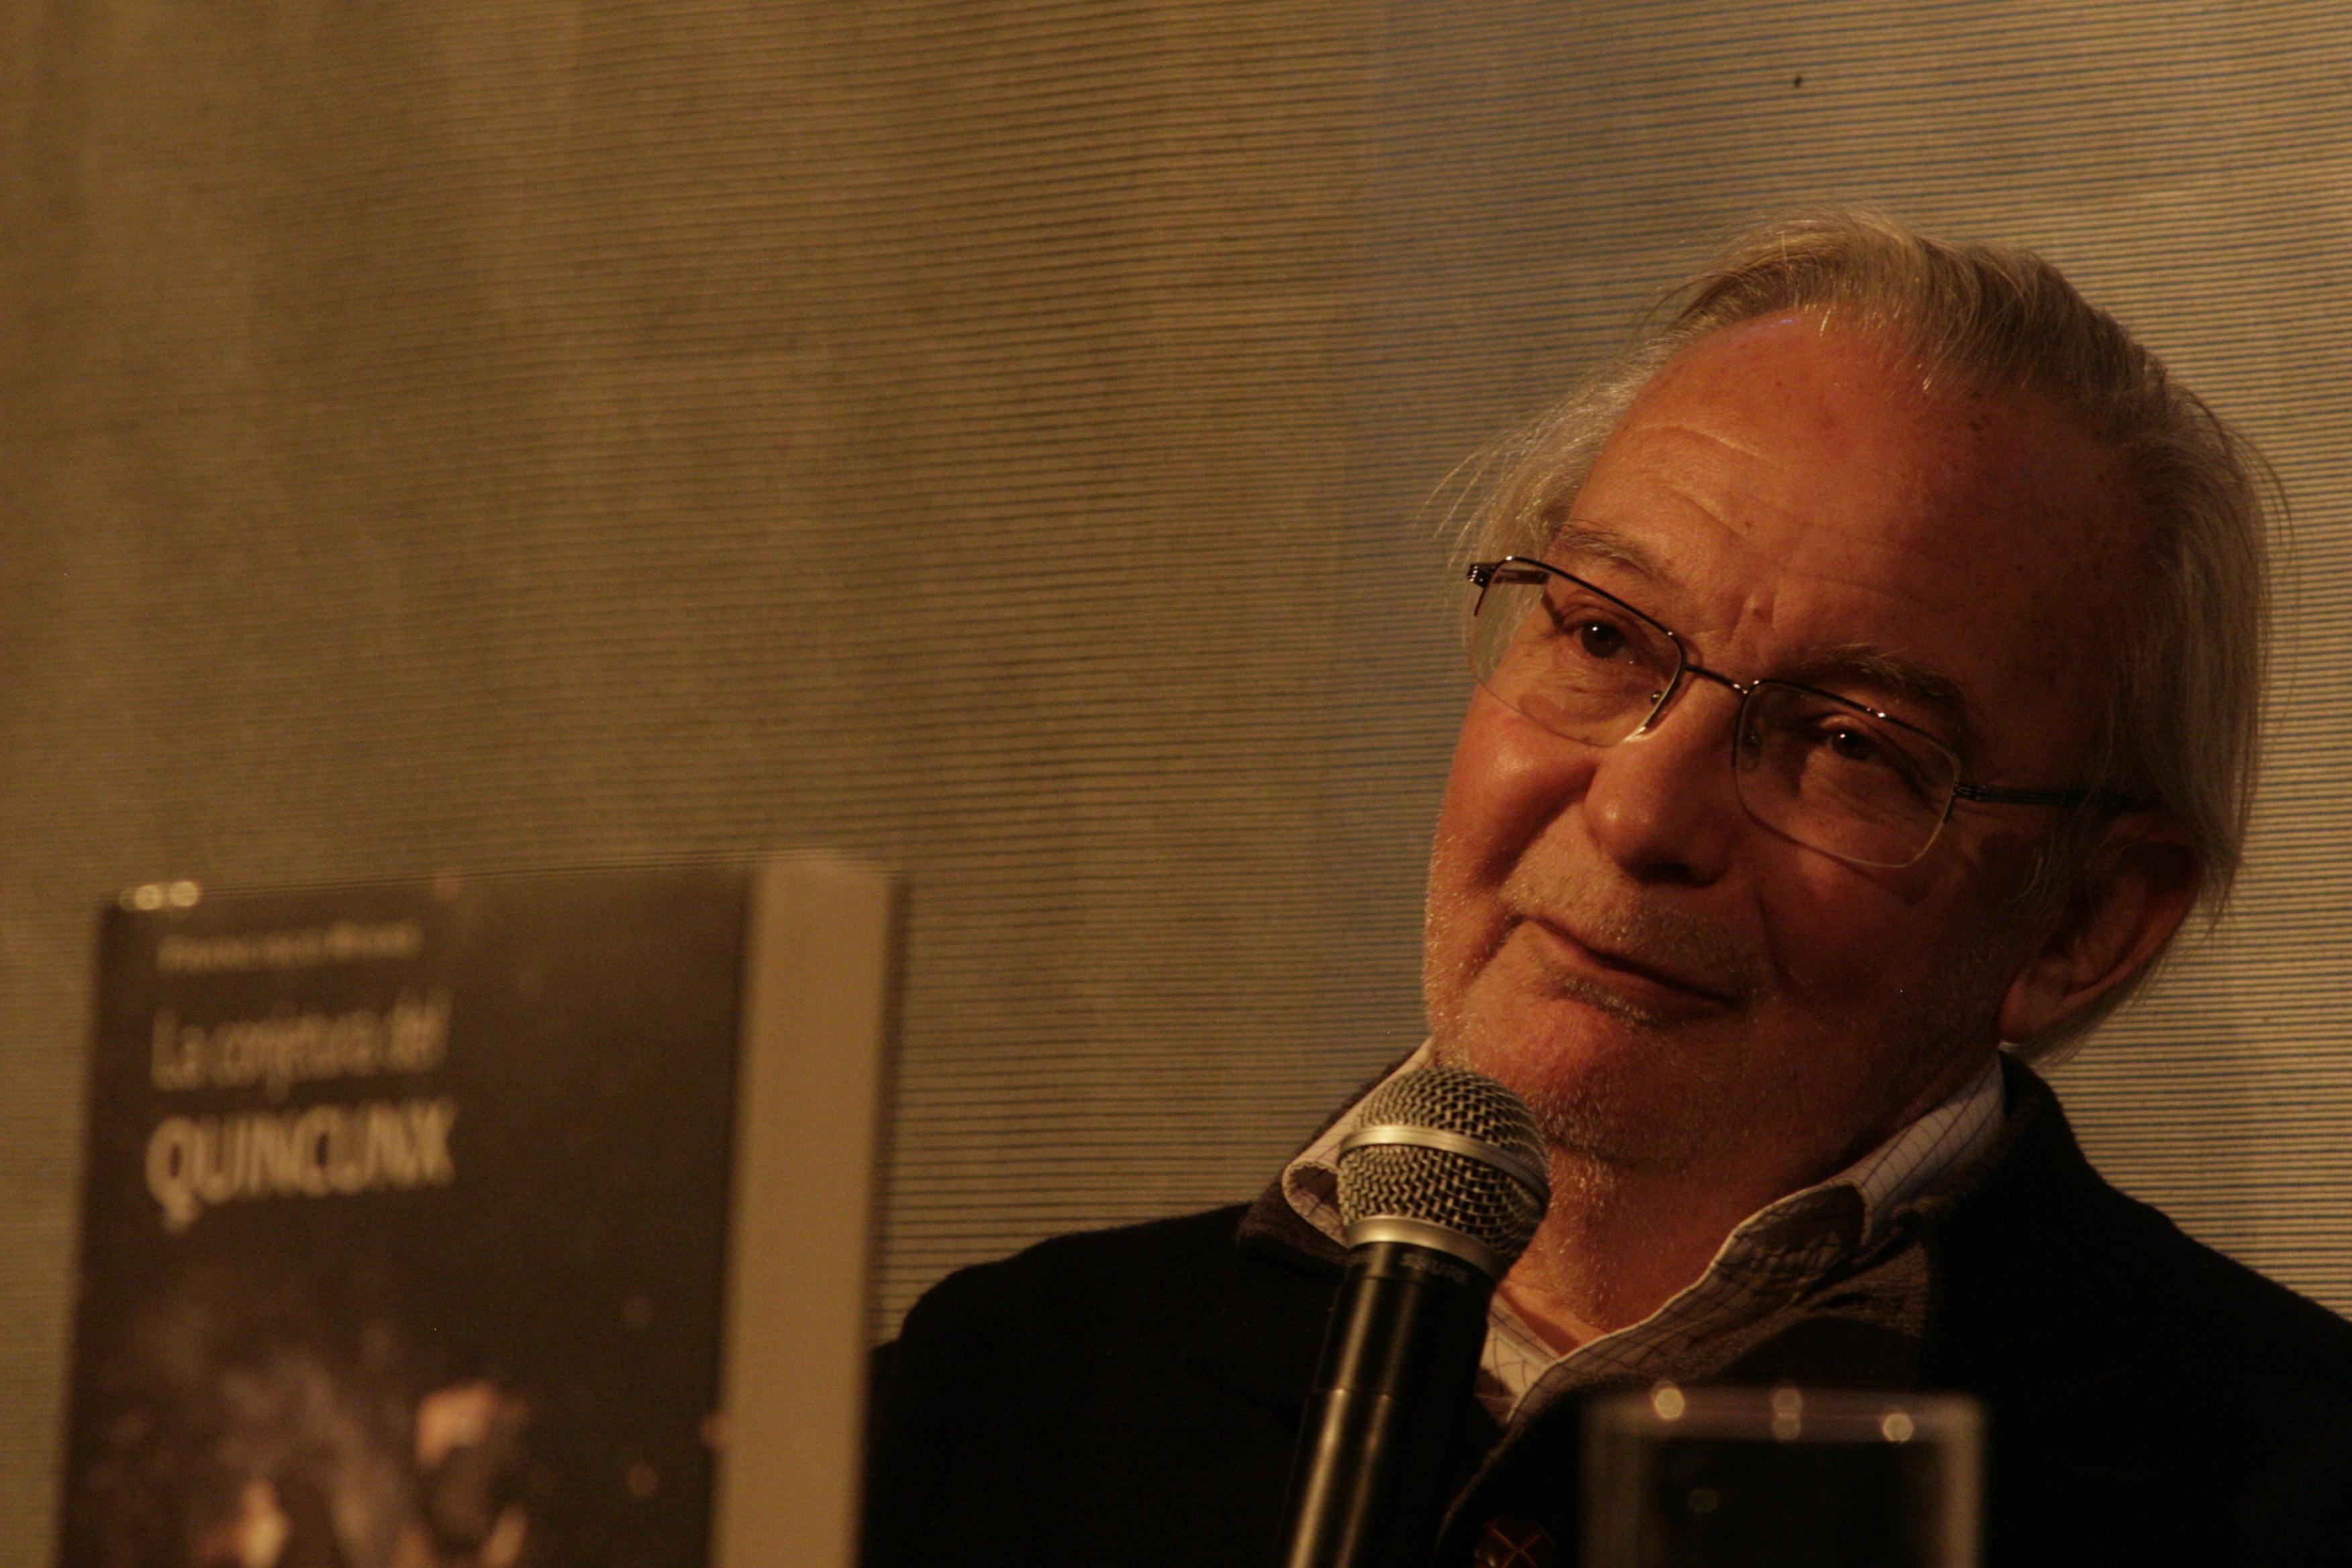 Francisco Rivas vuelve a la escena literaria en la FILSA 2014  con una novela fantástica sobre el universo